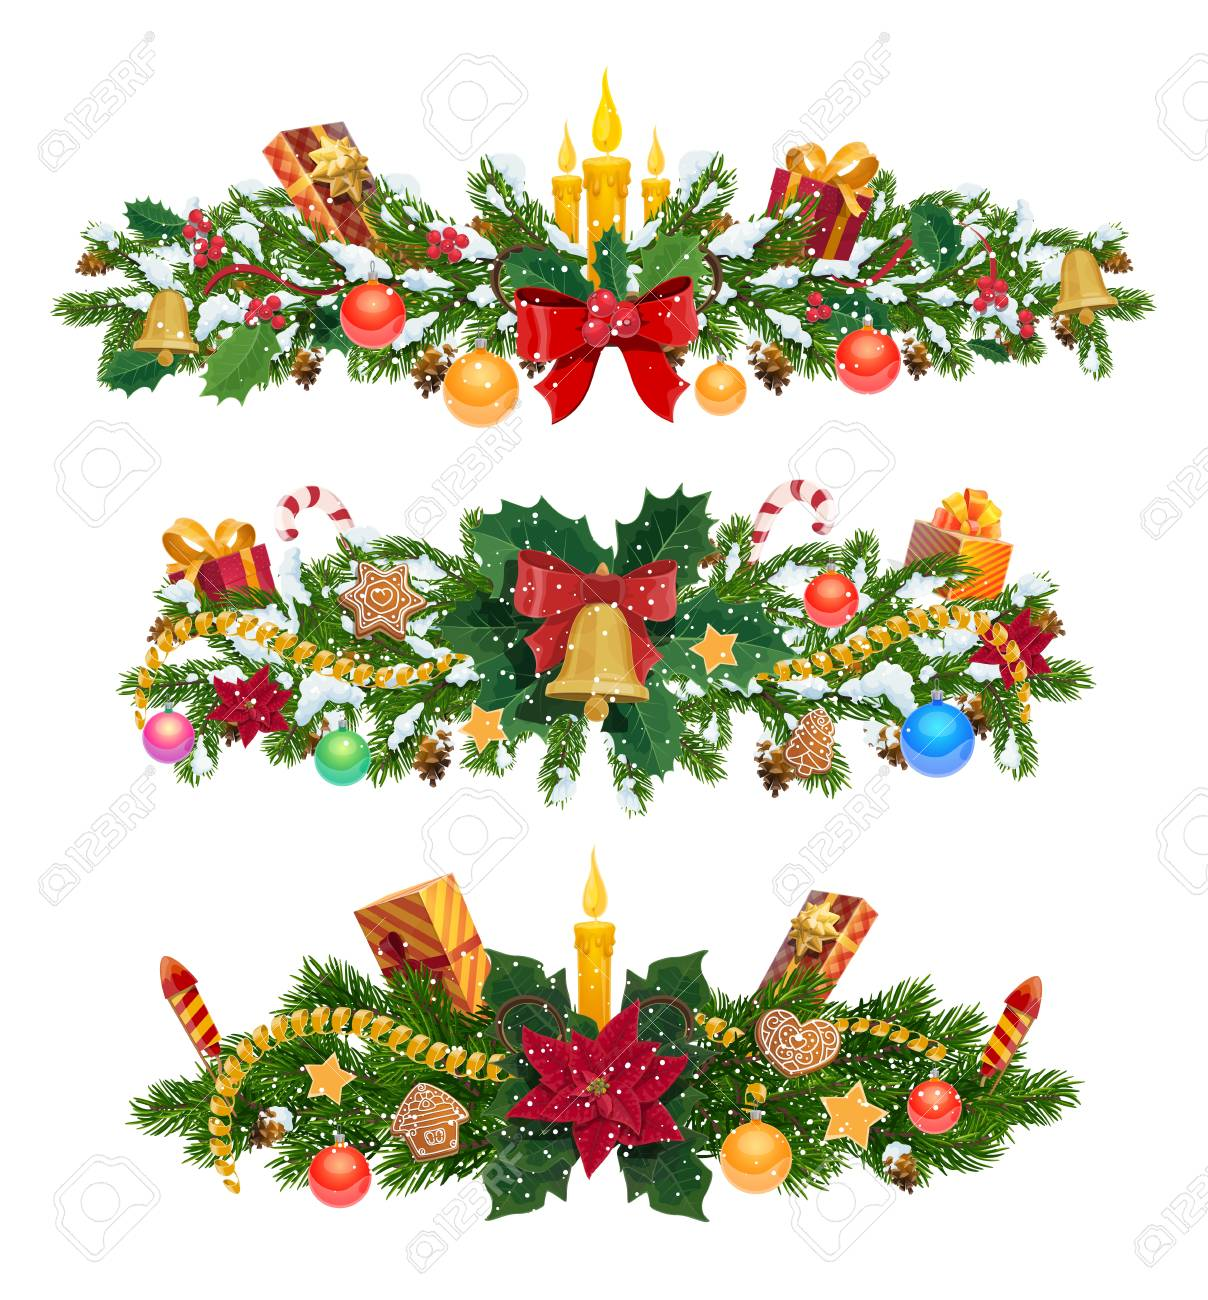 Christmas Garland And Decor Xmas Tree Branches Vector Fir Or